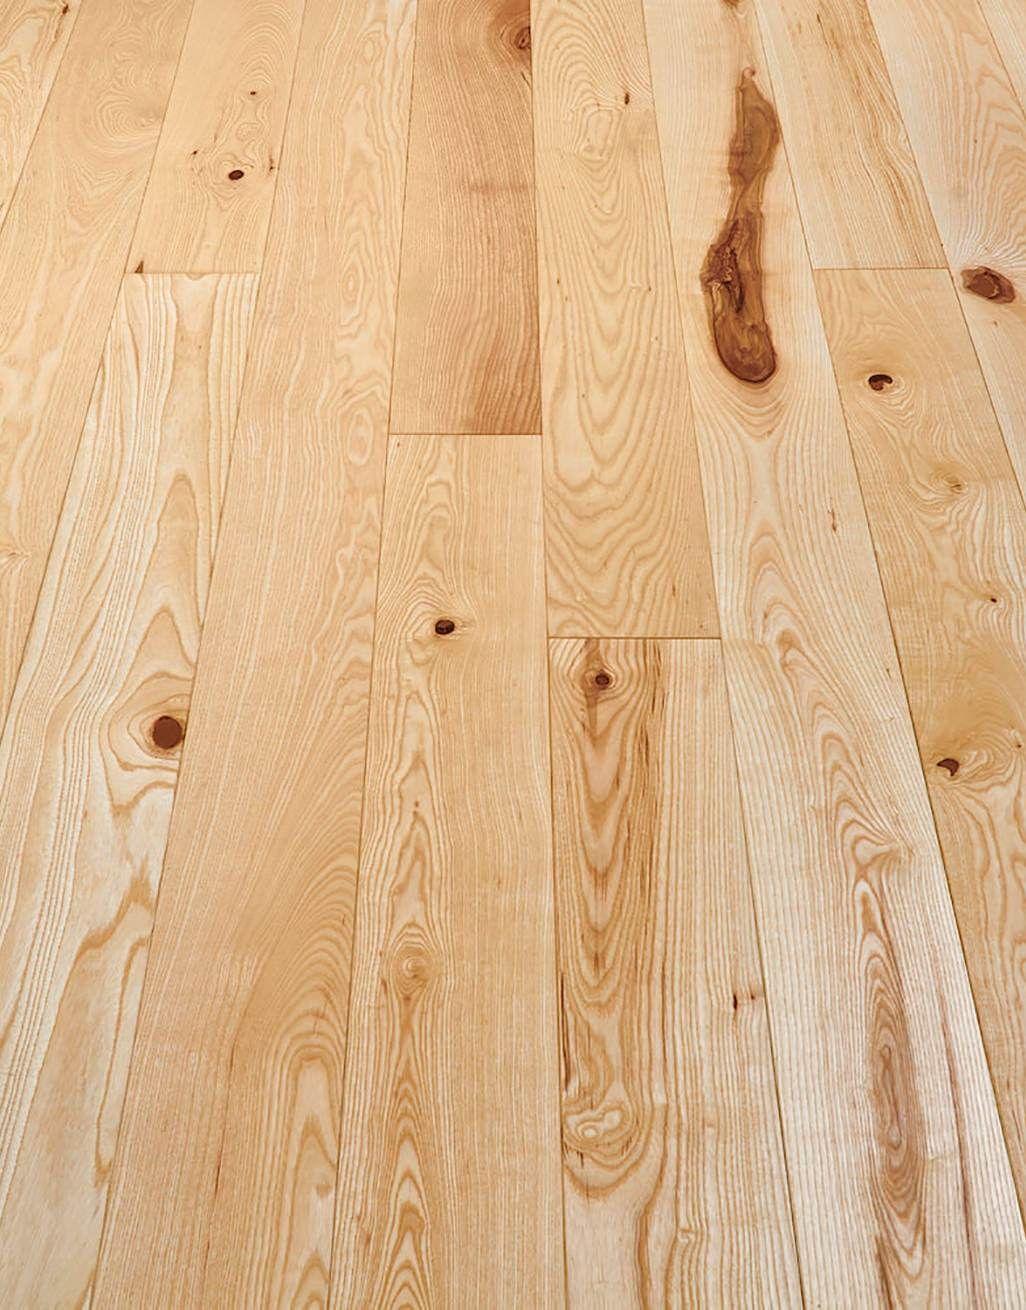 Natural Oiled Ash Solid Wood Flooring, Ash Wood Laminate Flooring